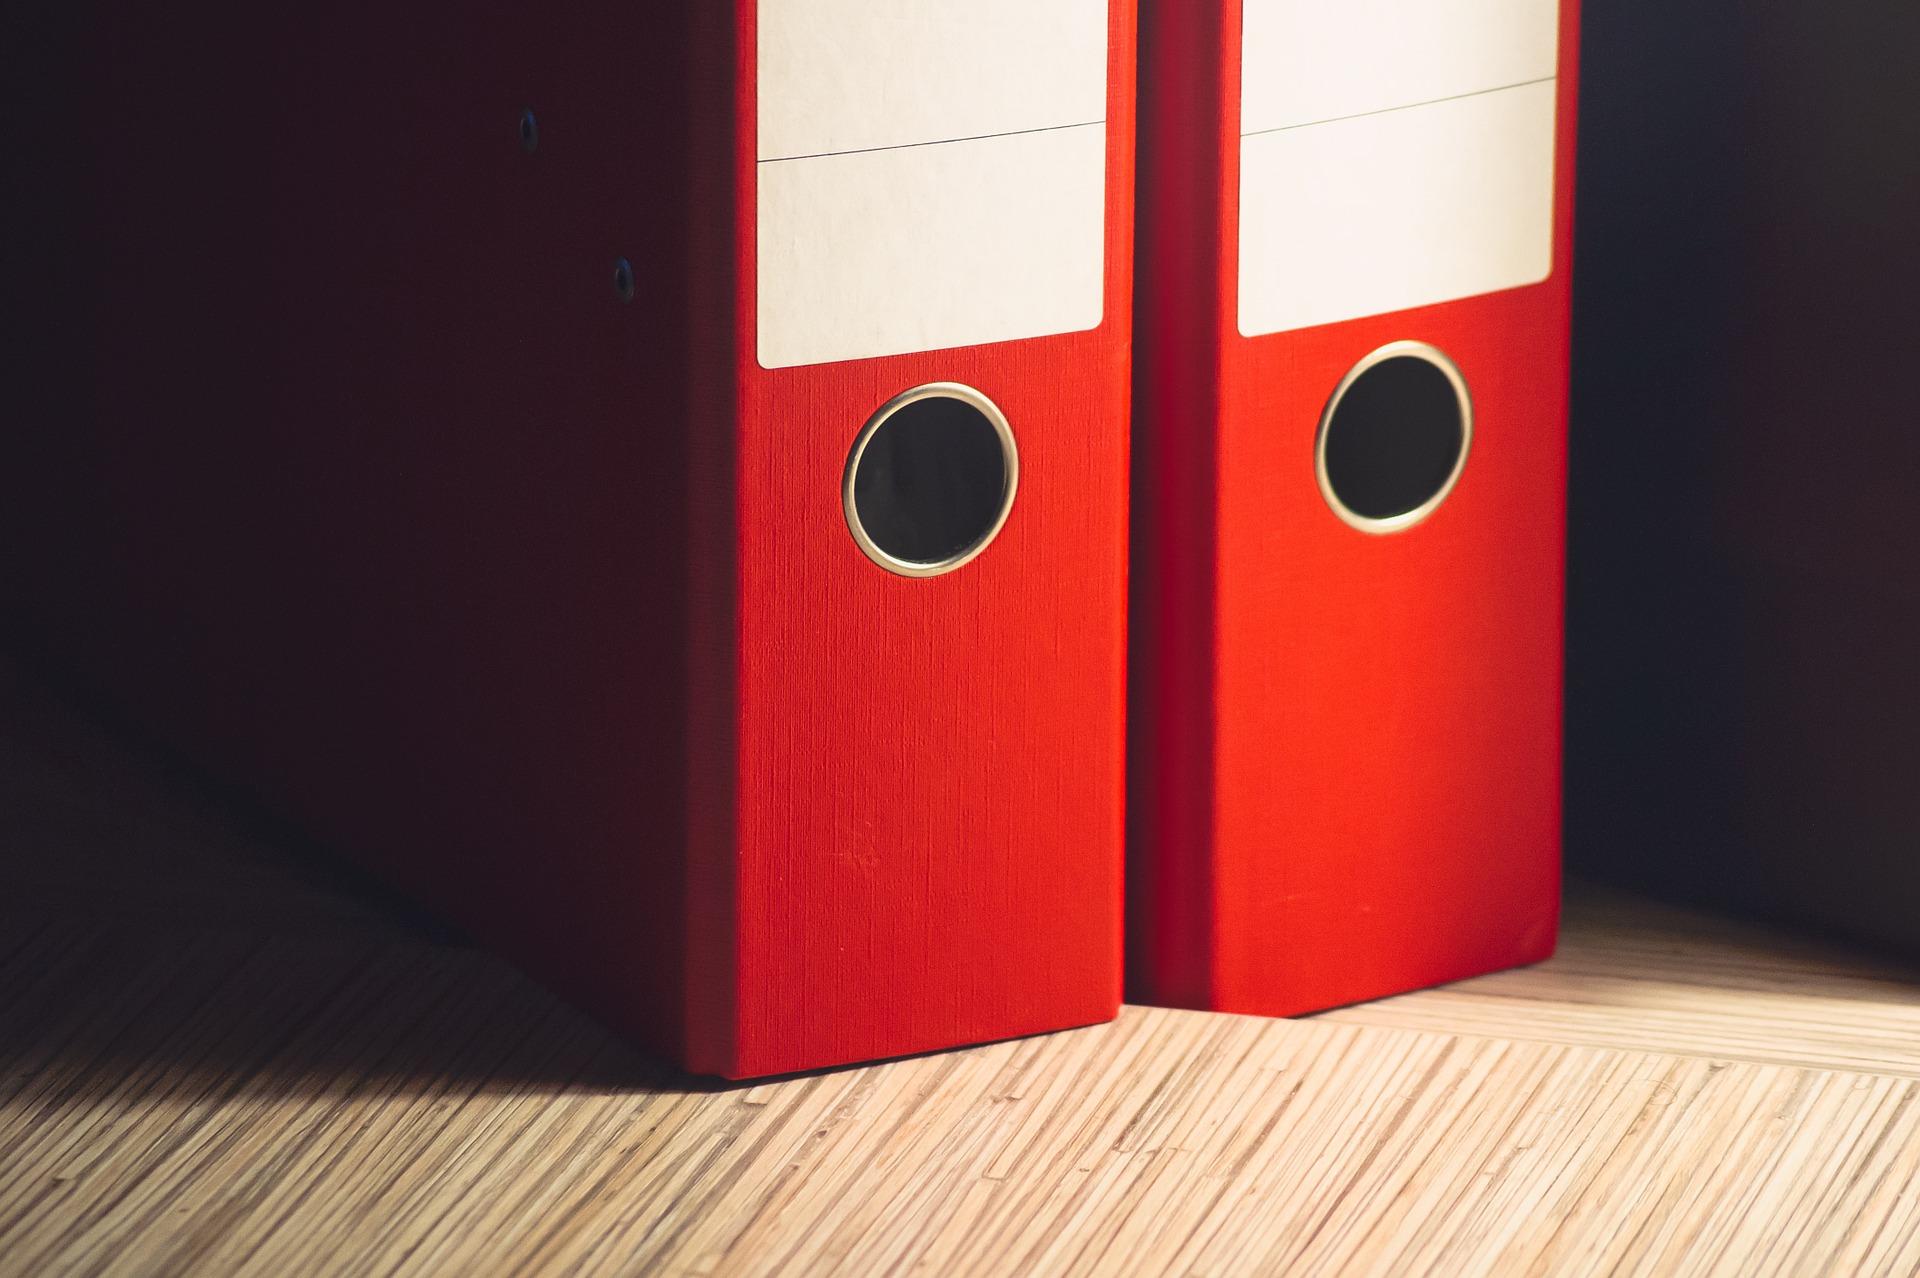 file-folders-923523_1920.jpg